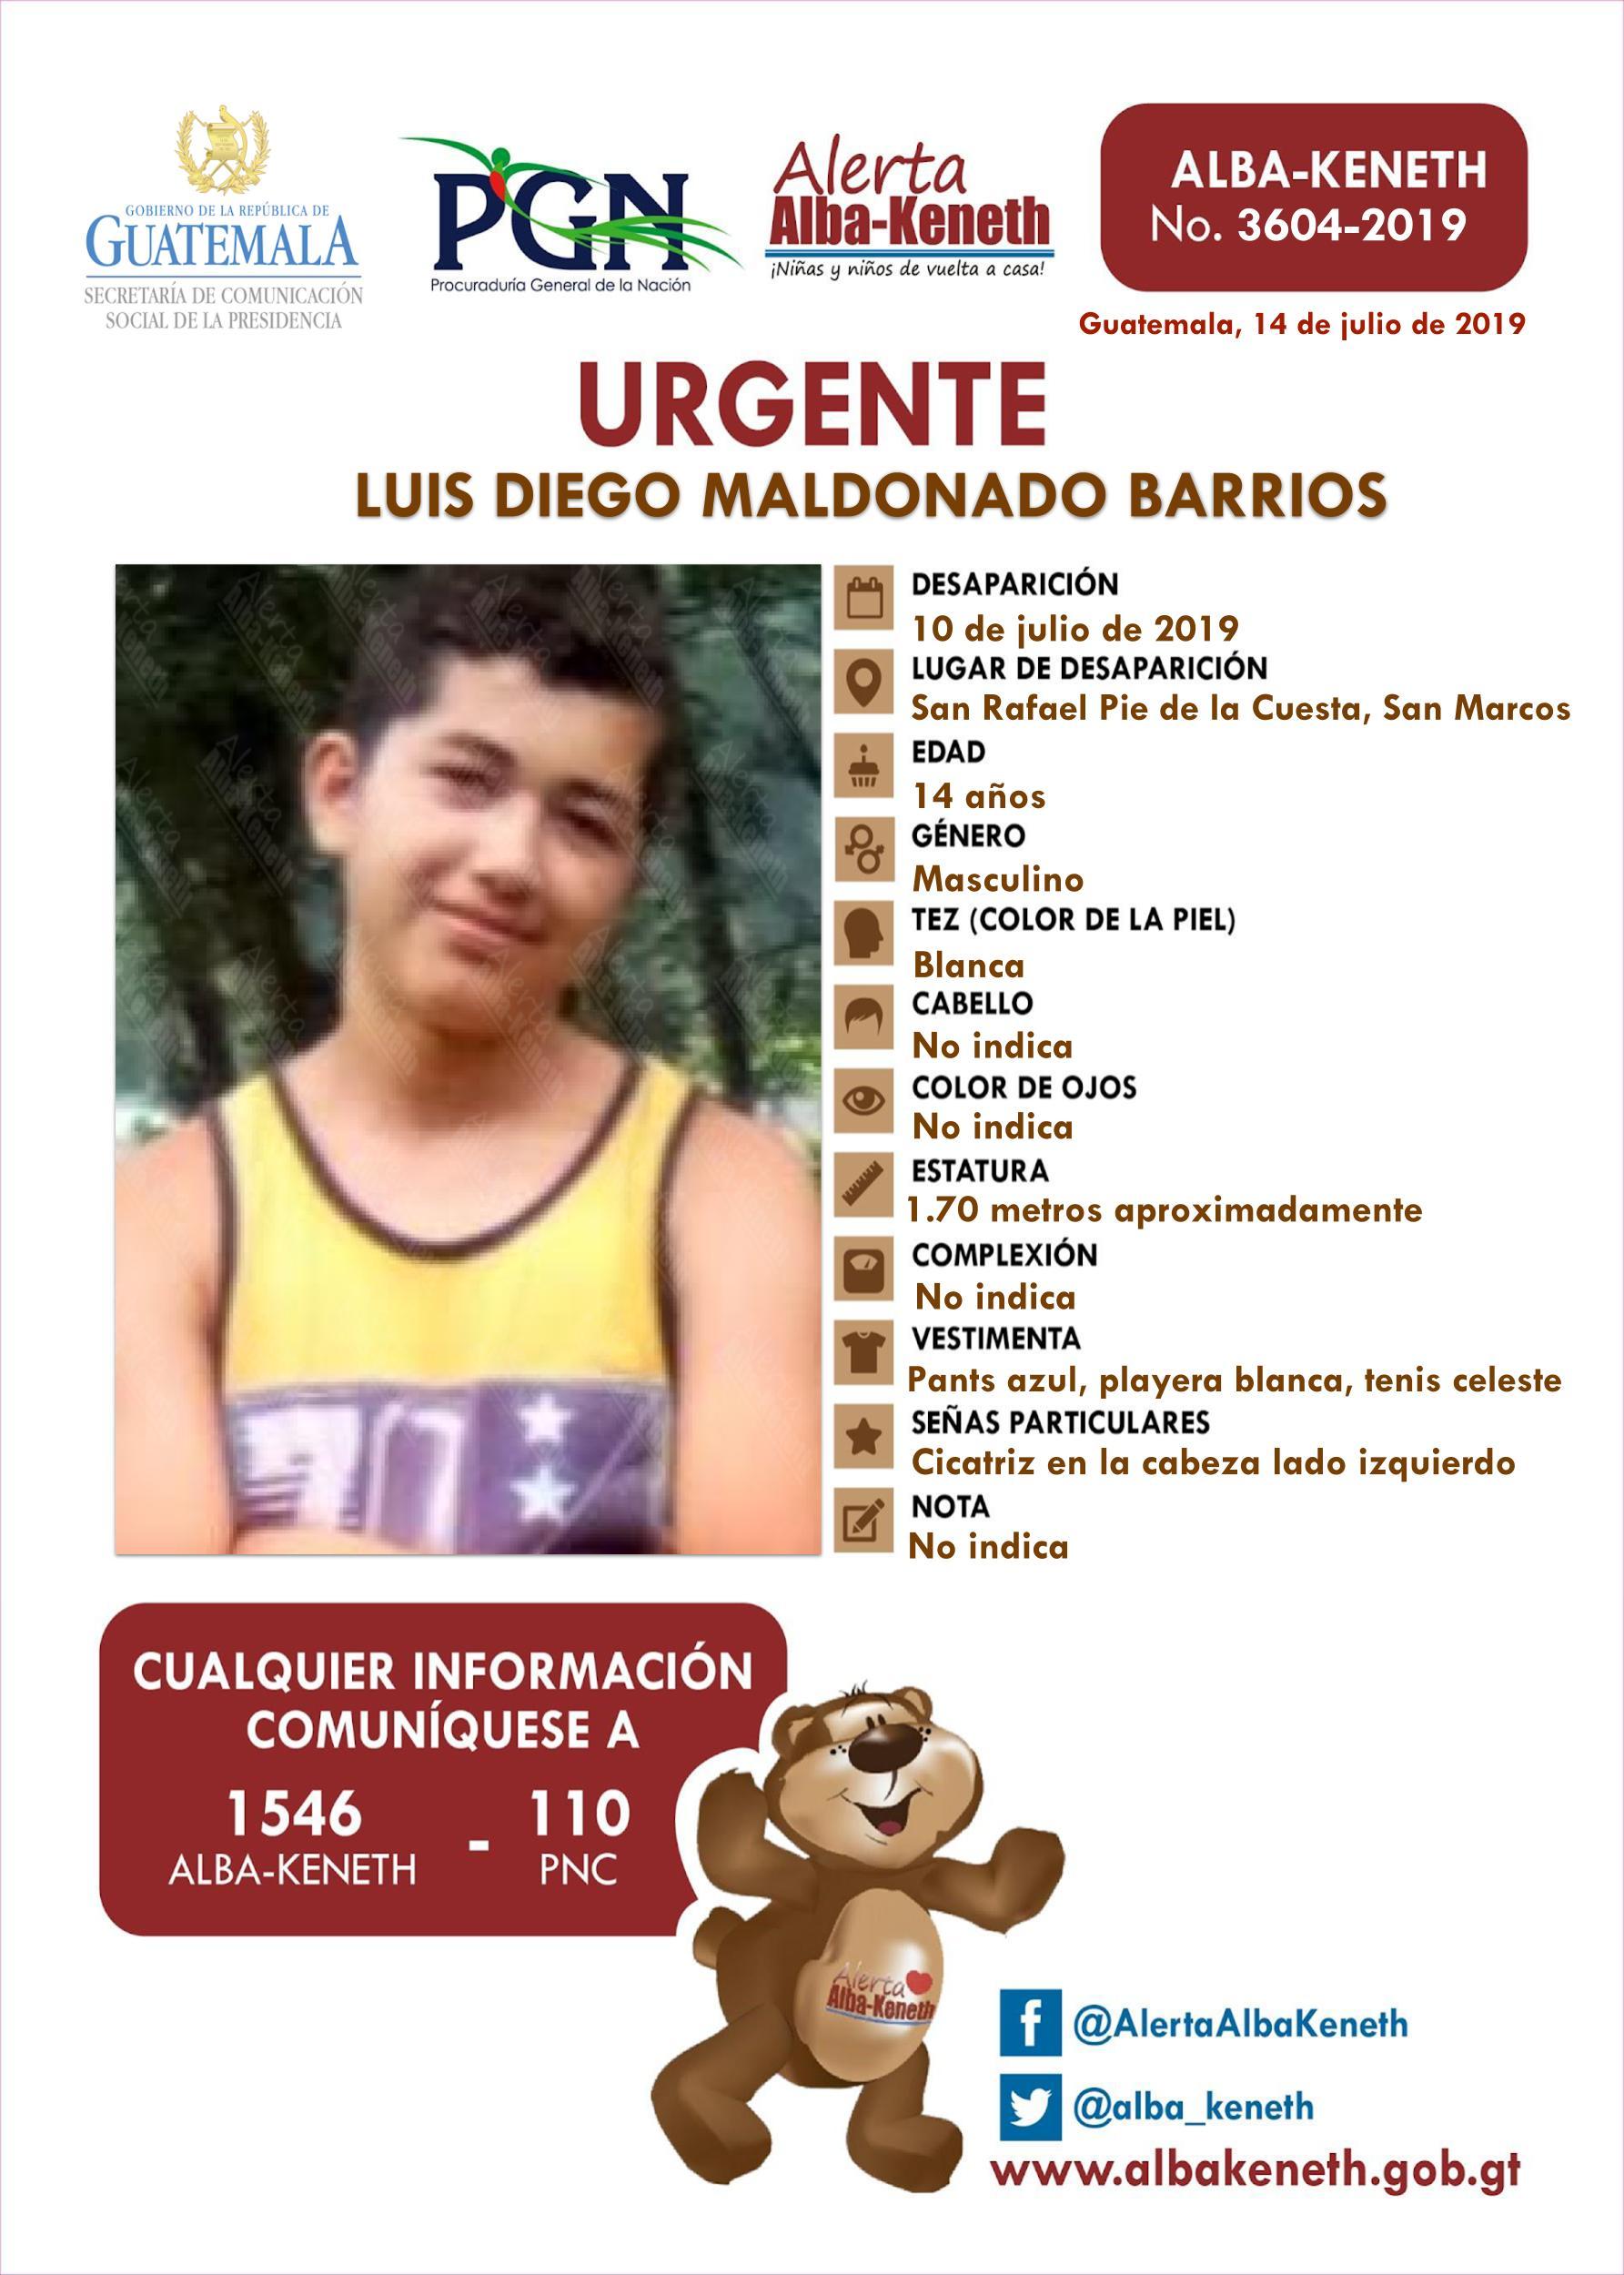 Luis Diego Maldonado Barrios